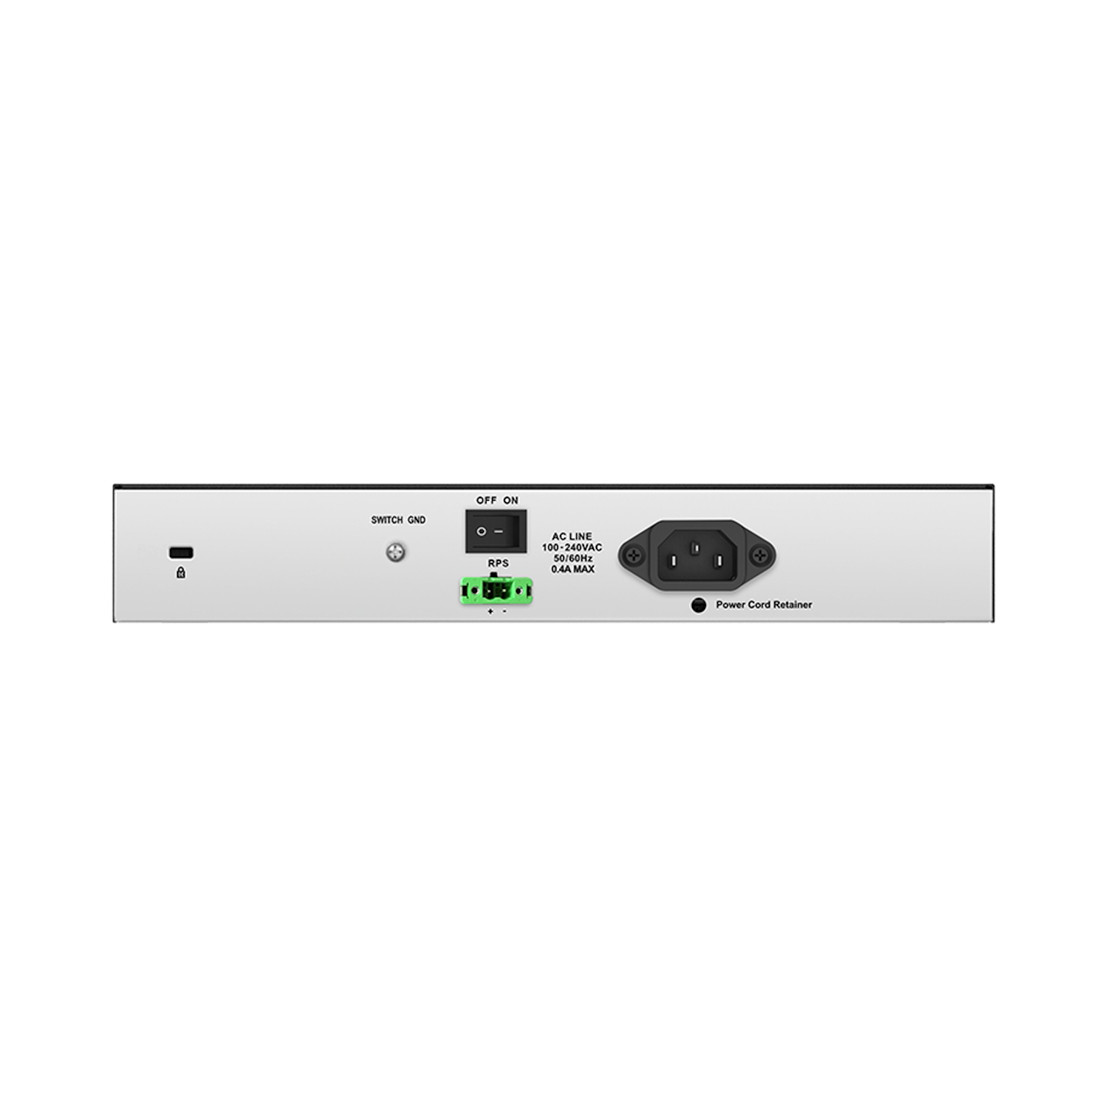 Коммутатор D-Link DGS-1210-12TS/ME/B1A